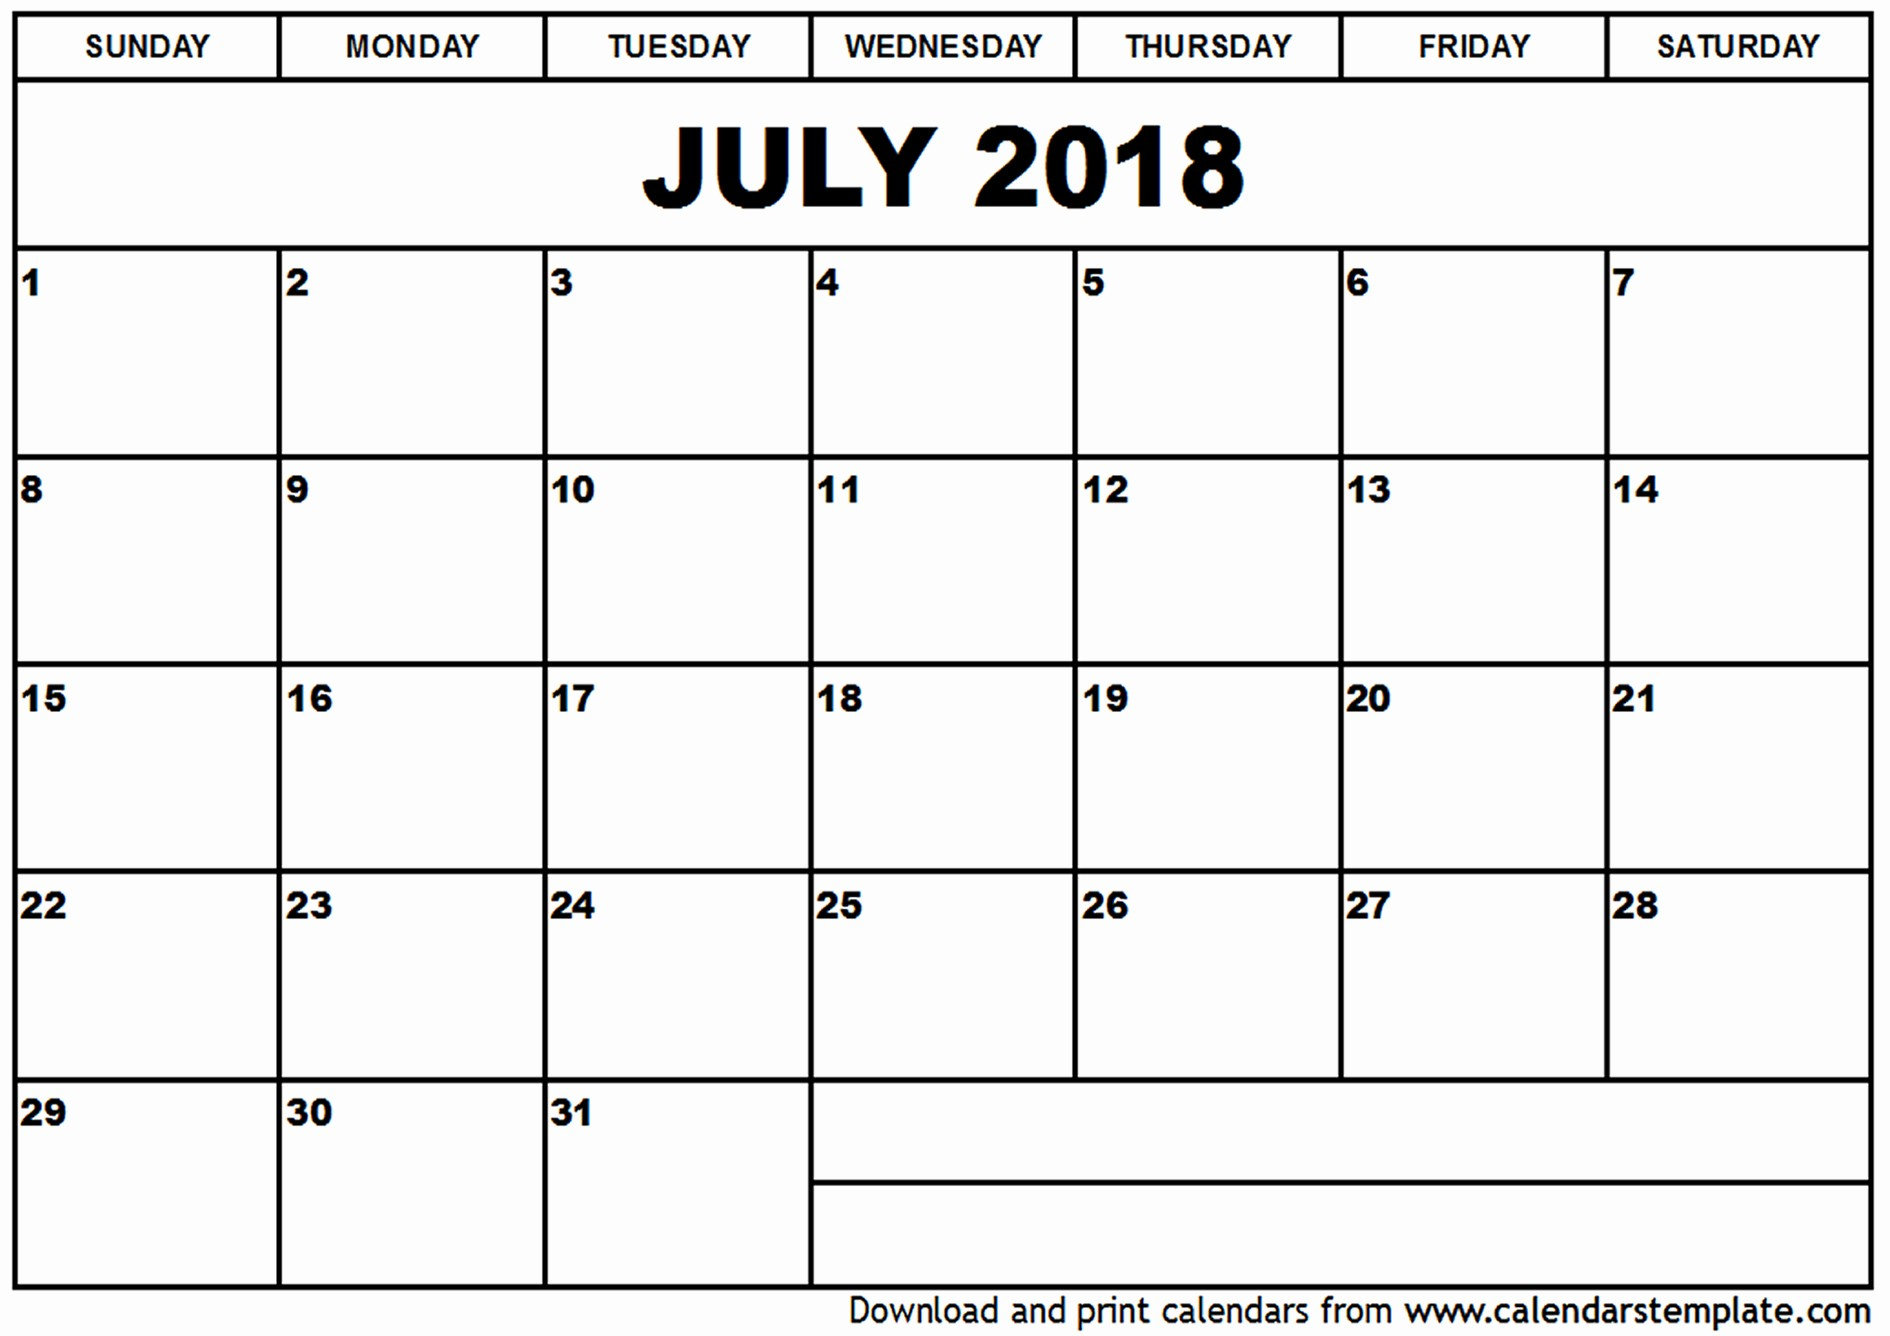 Free Printable 2018 Calendar Templates Awesome July 2018 Calendar Template